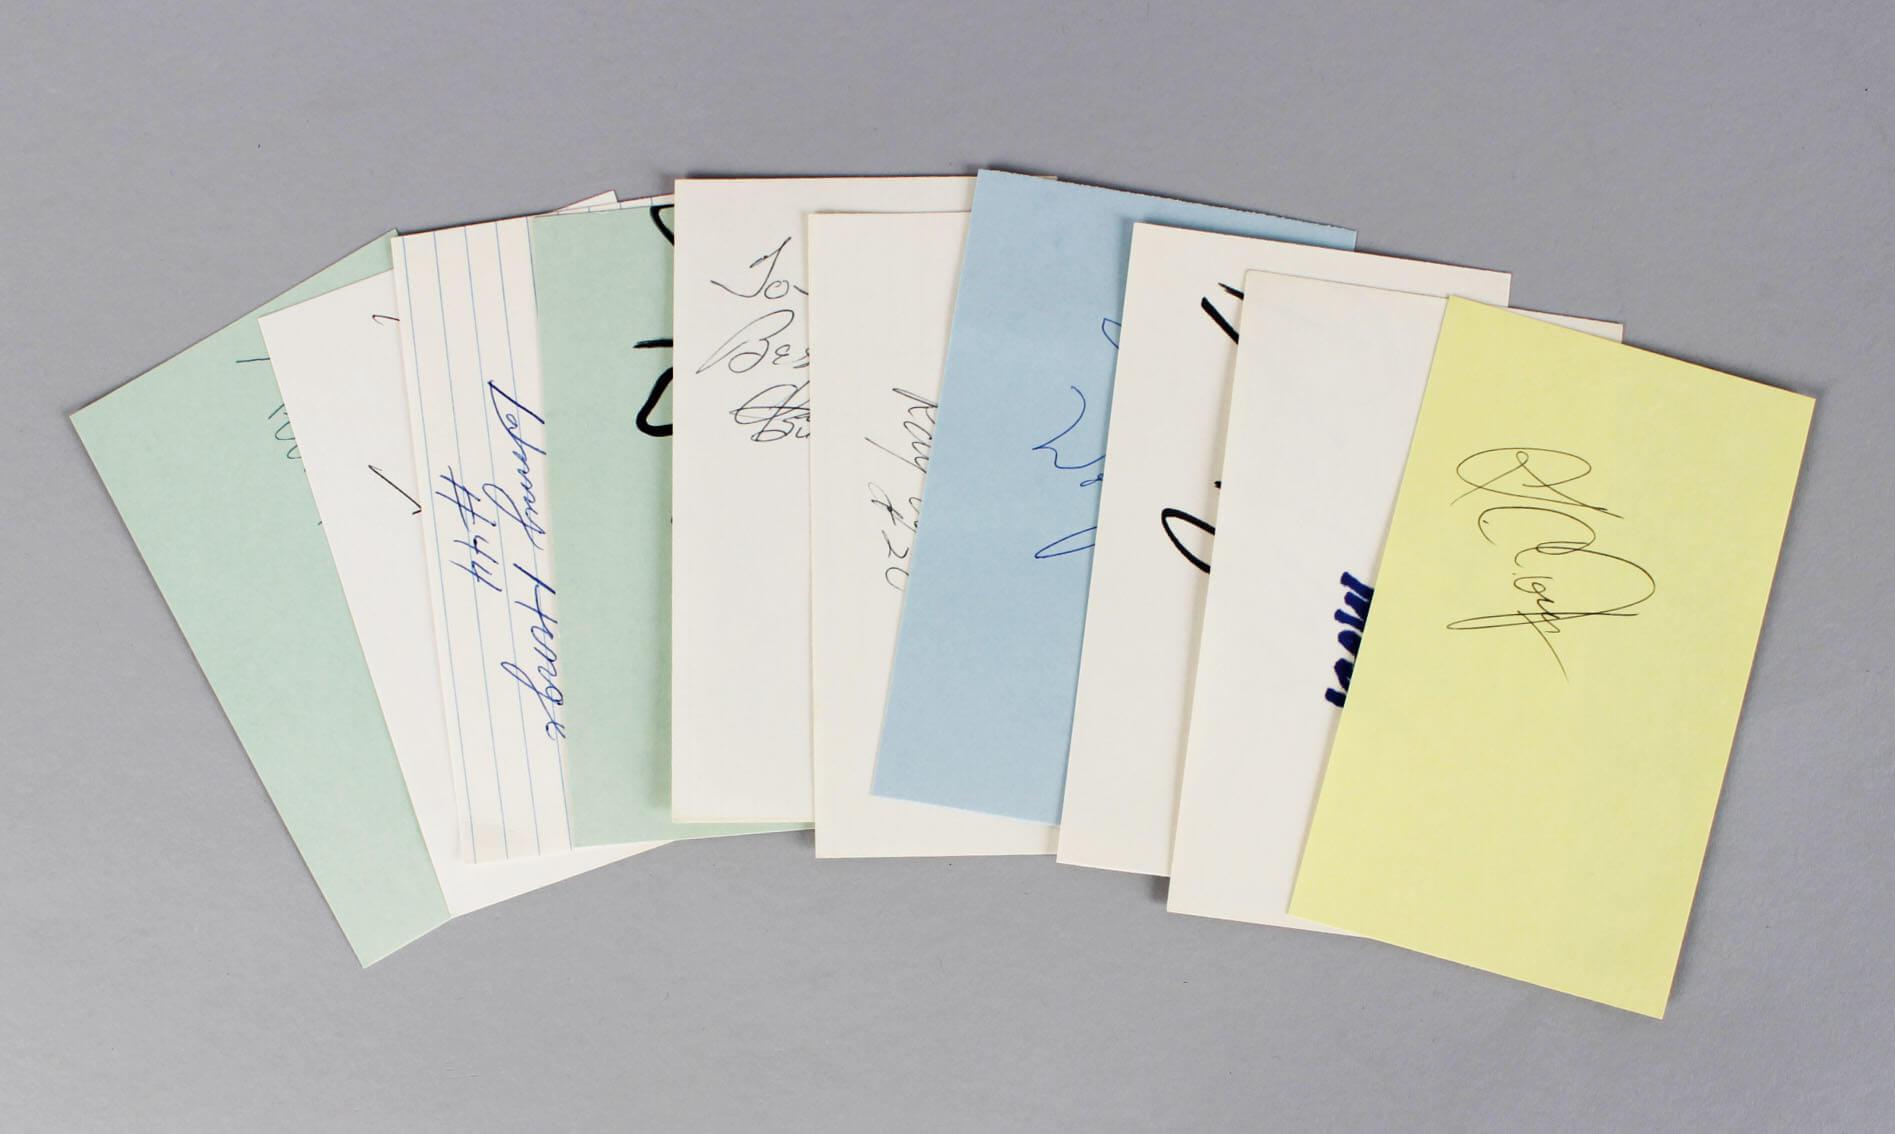 Boston Celtics Signed 3x5 Index Card Lot (6) - Tom Heinsohn, K.C. Jones, Johnny Most etc. (JSA)